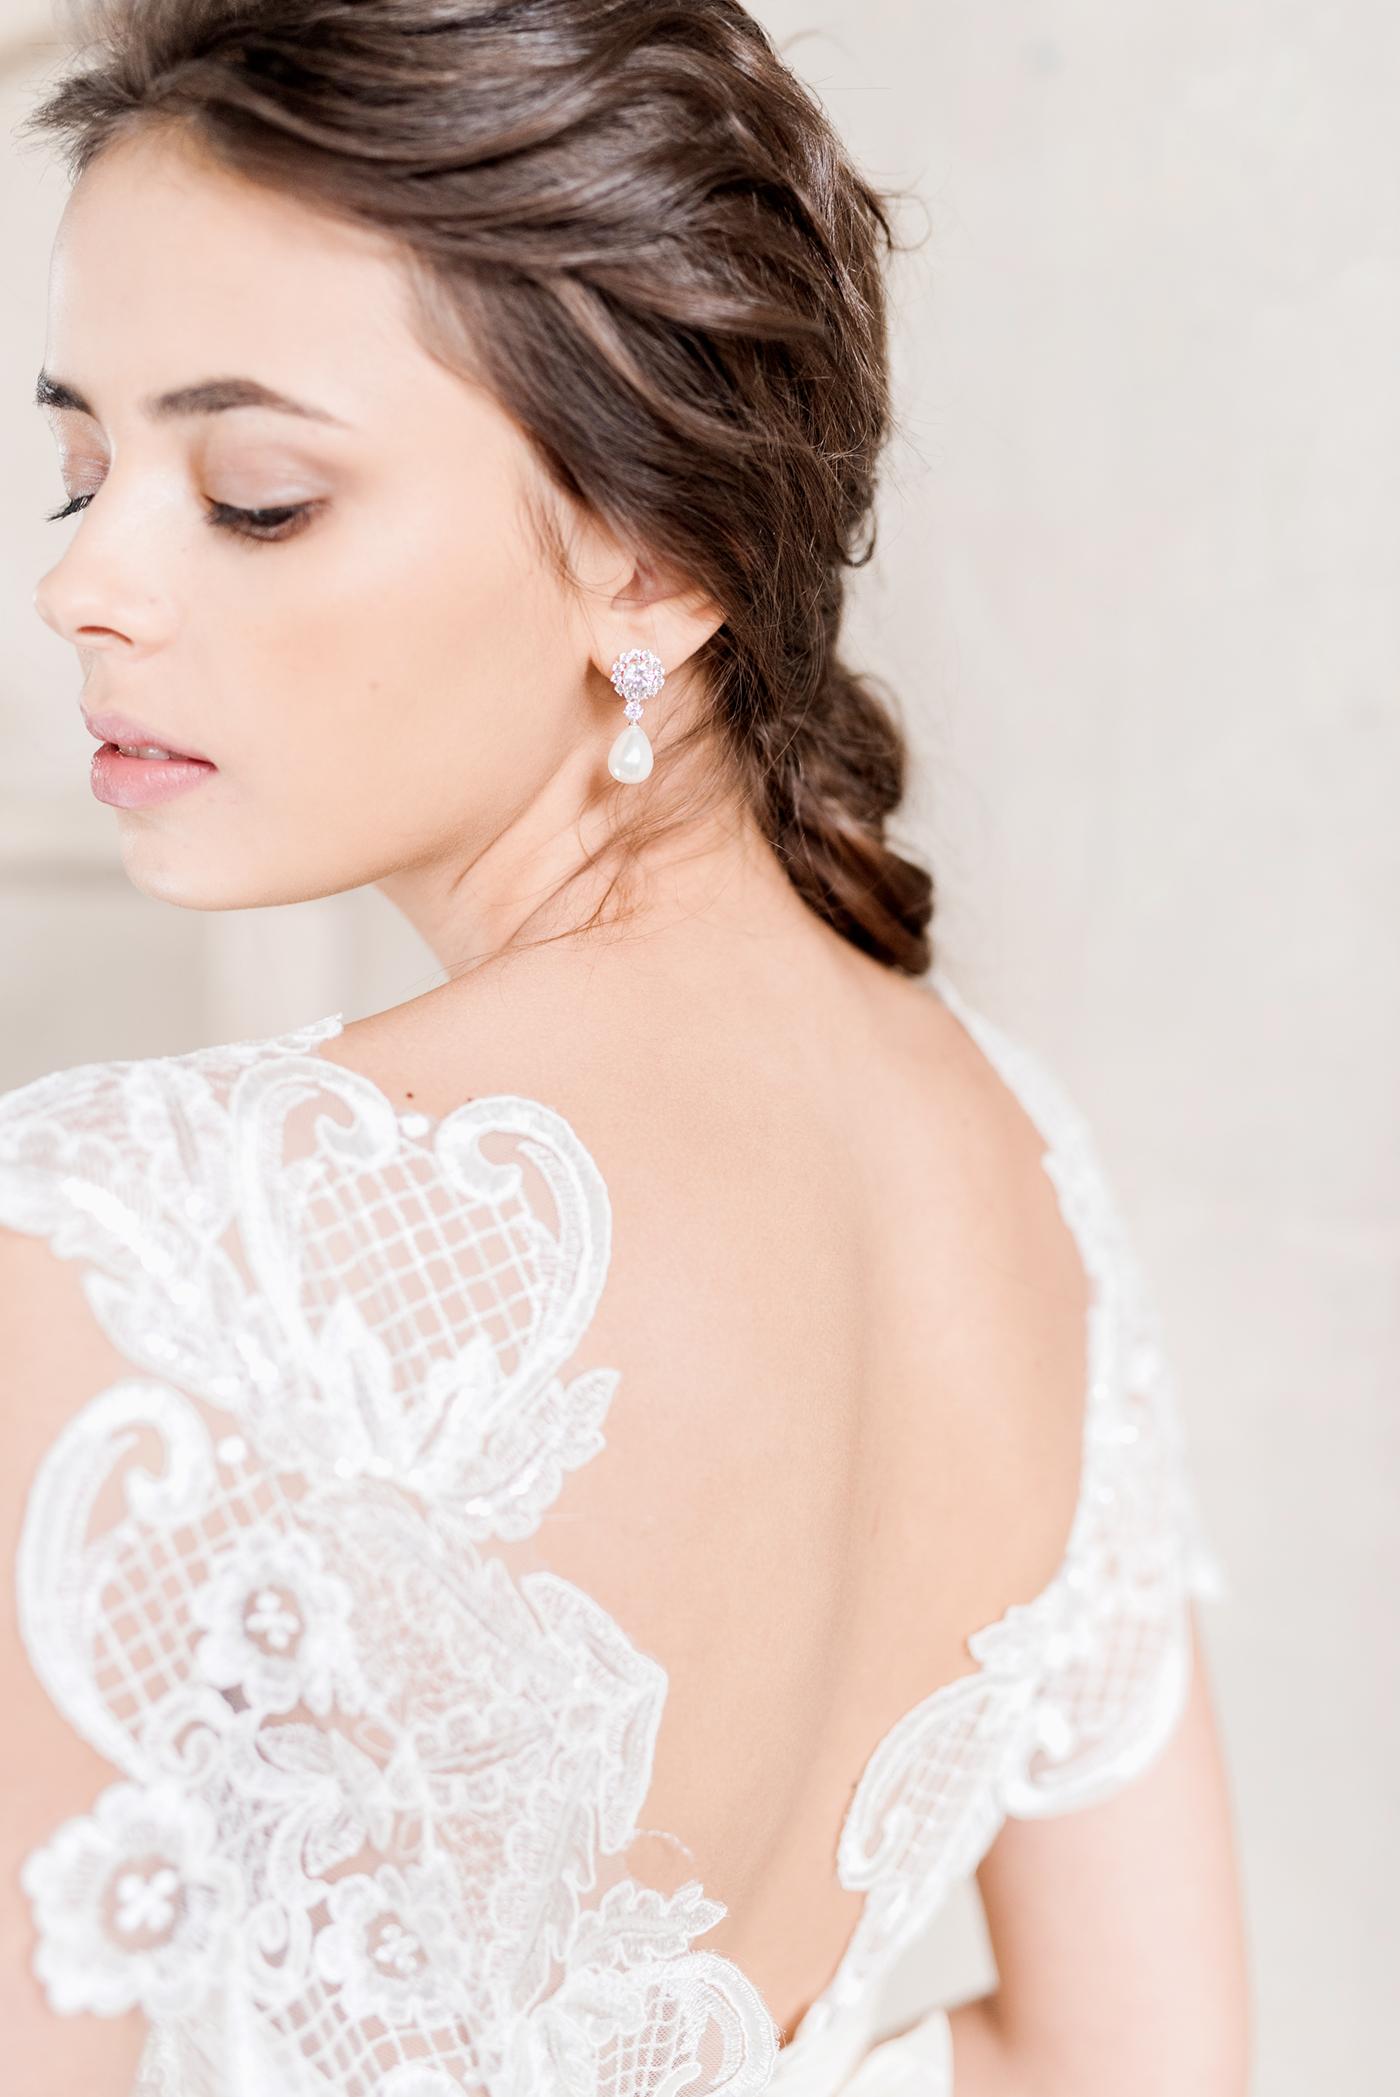 Anna Campbell Bridal   Savannah Dress   Vintage Inspired Lace Wedding Dress   Eternal Heart Collection